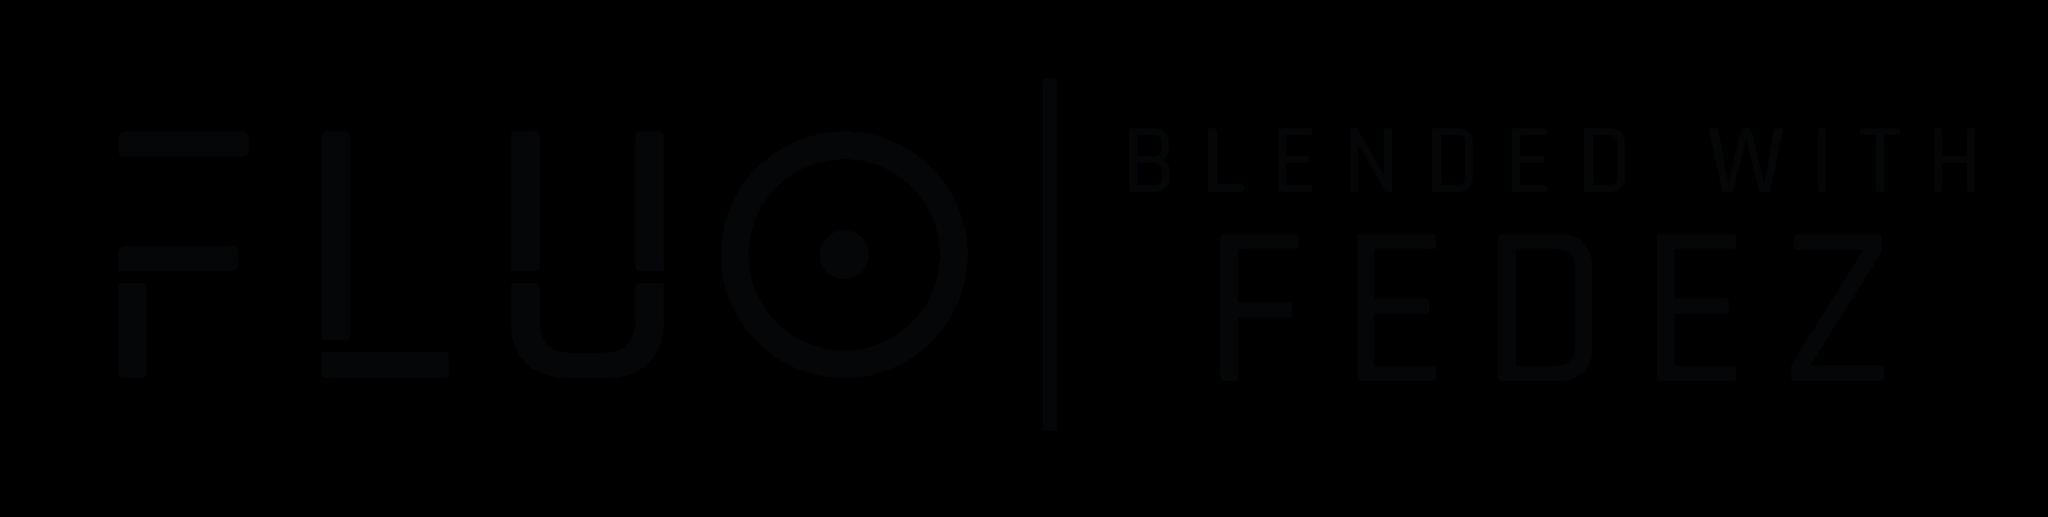 LogoFLUO.png